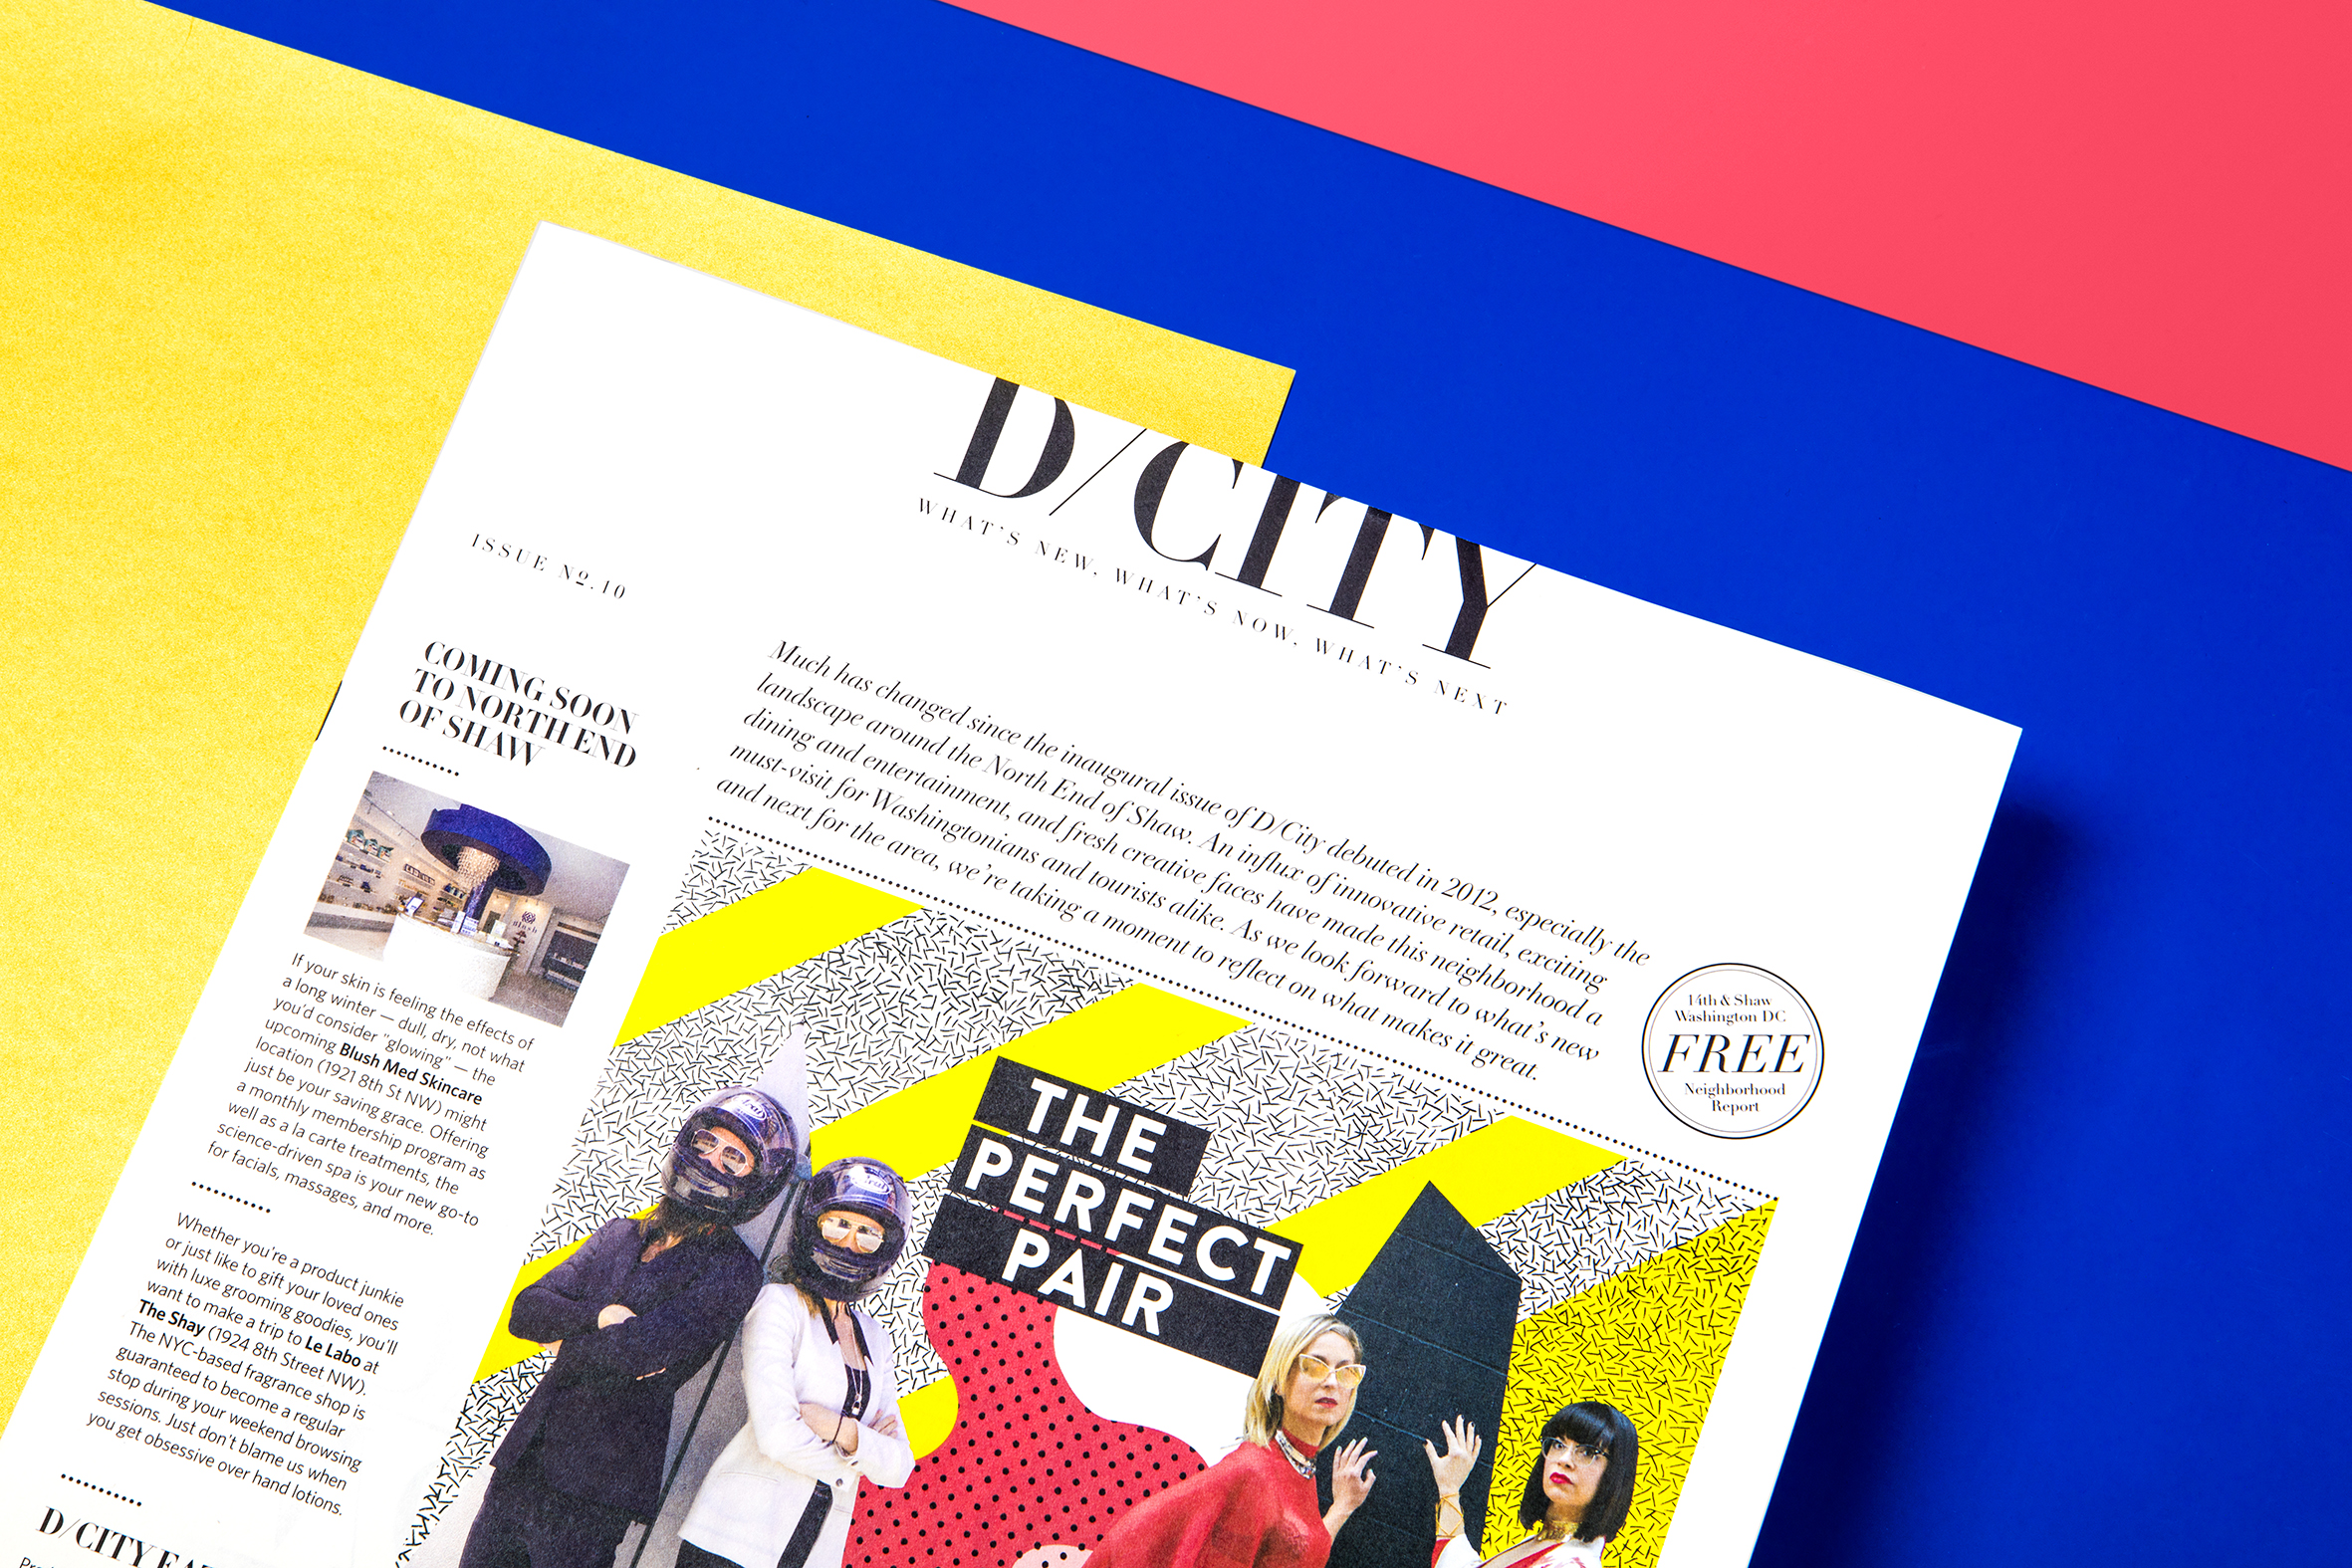 D City Printed-062.jpg